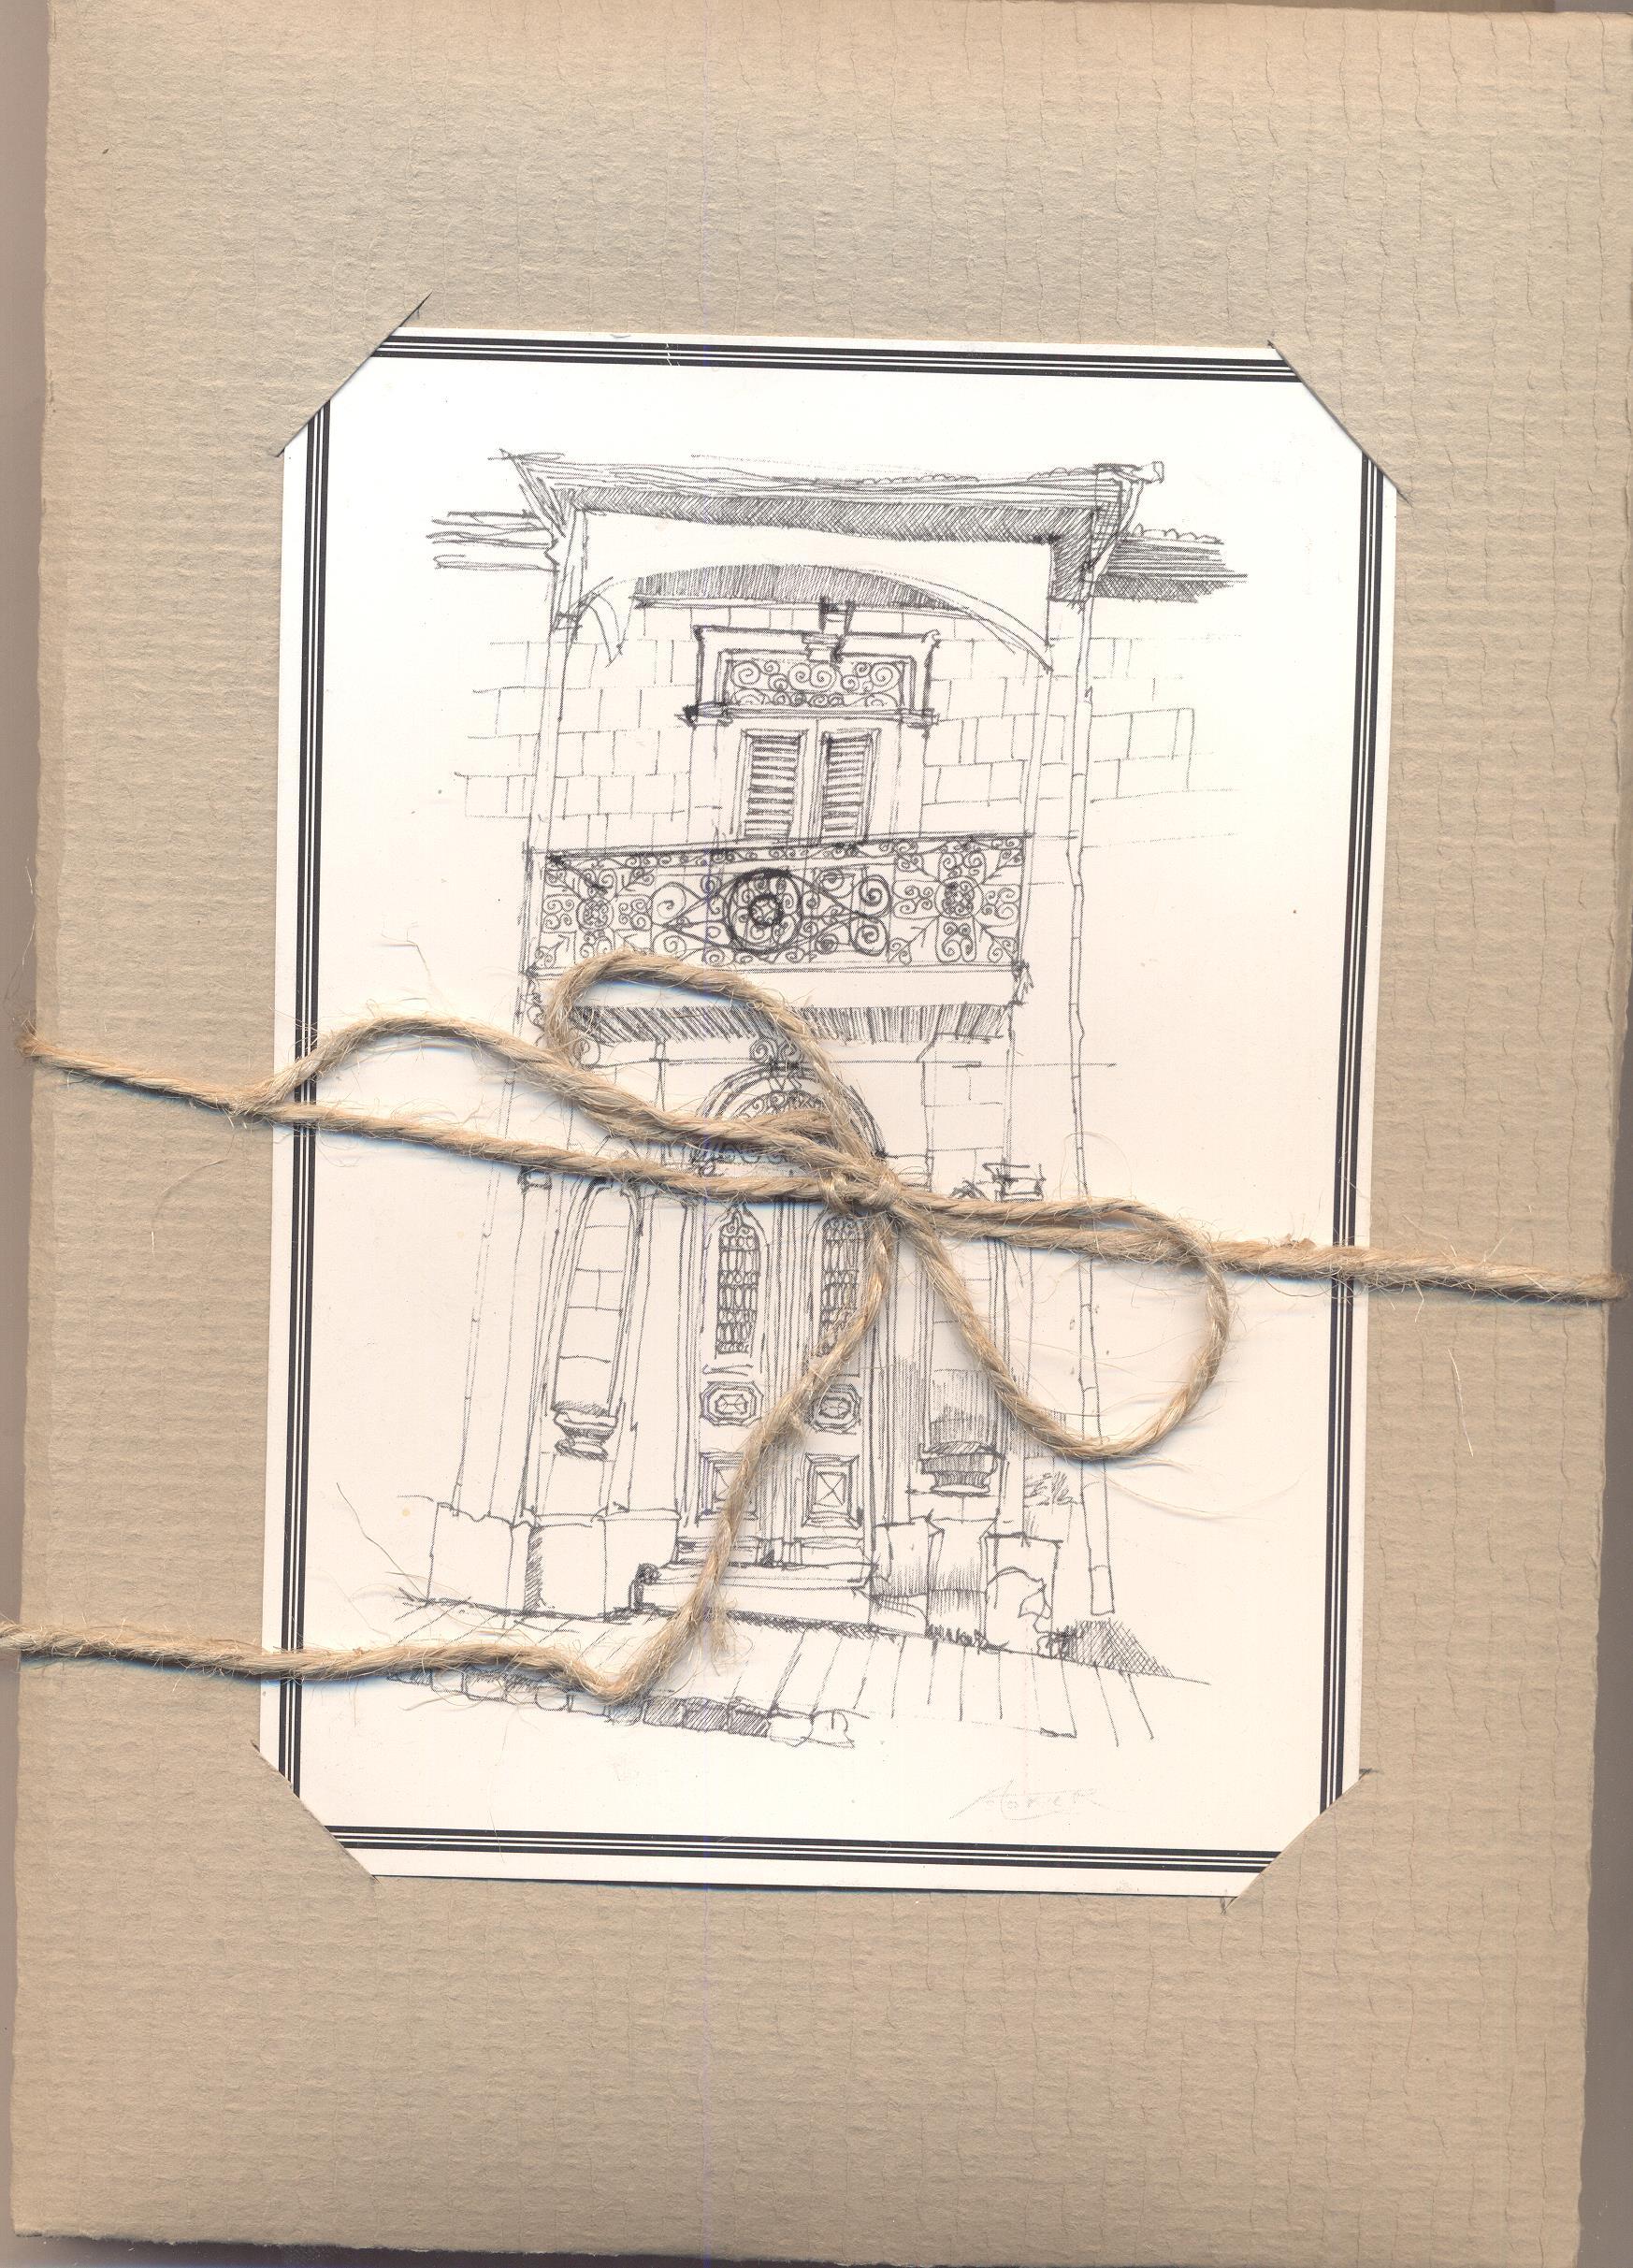 Alexandra Storer Cards (Architectural Series Nicosia, Cyprus)